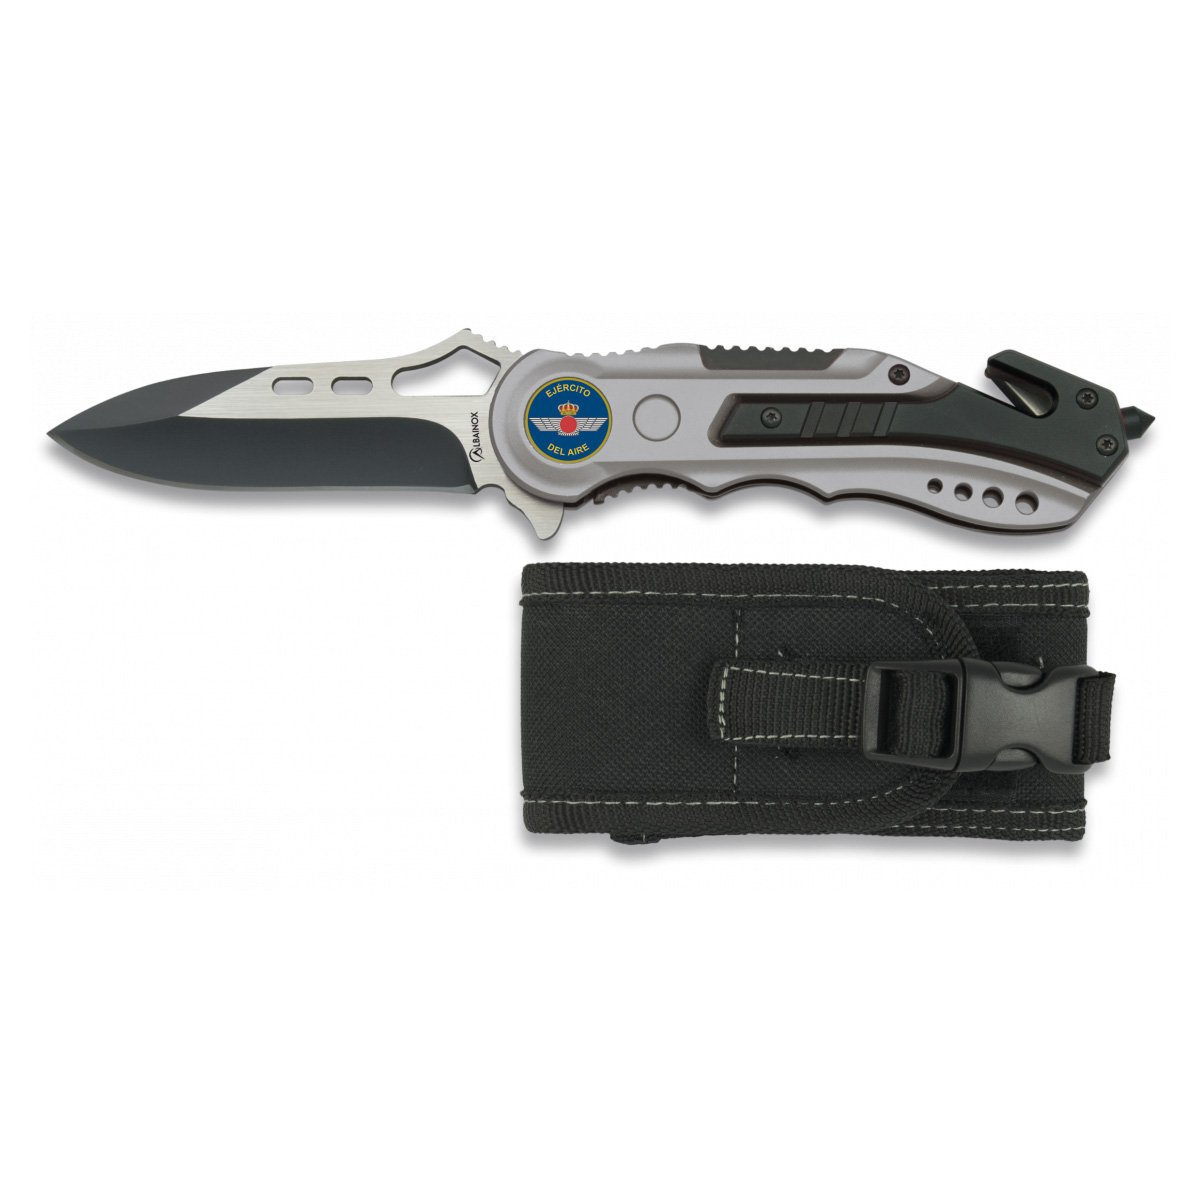 Albainox Army Air Folding Knife Spain Aluminum Handle Aluminum 8.1 Inch Stainless Steel Blade Cuter Seat Belt, Splitter Tip And Case 19461gr1016